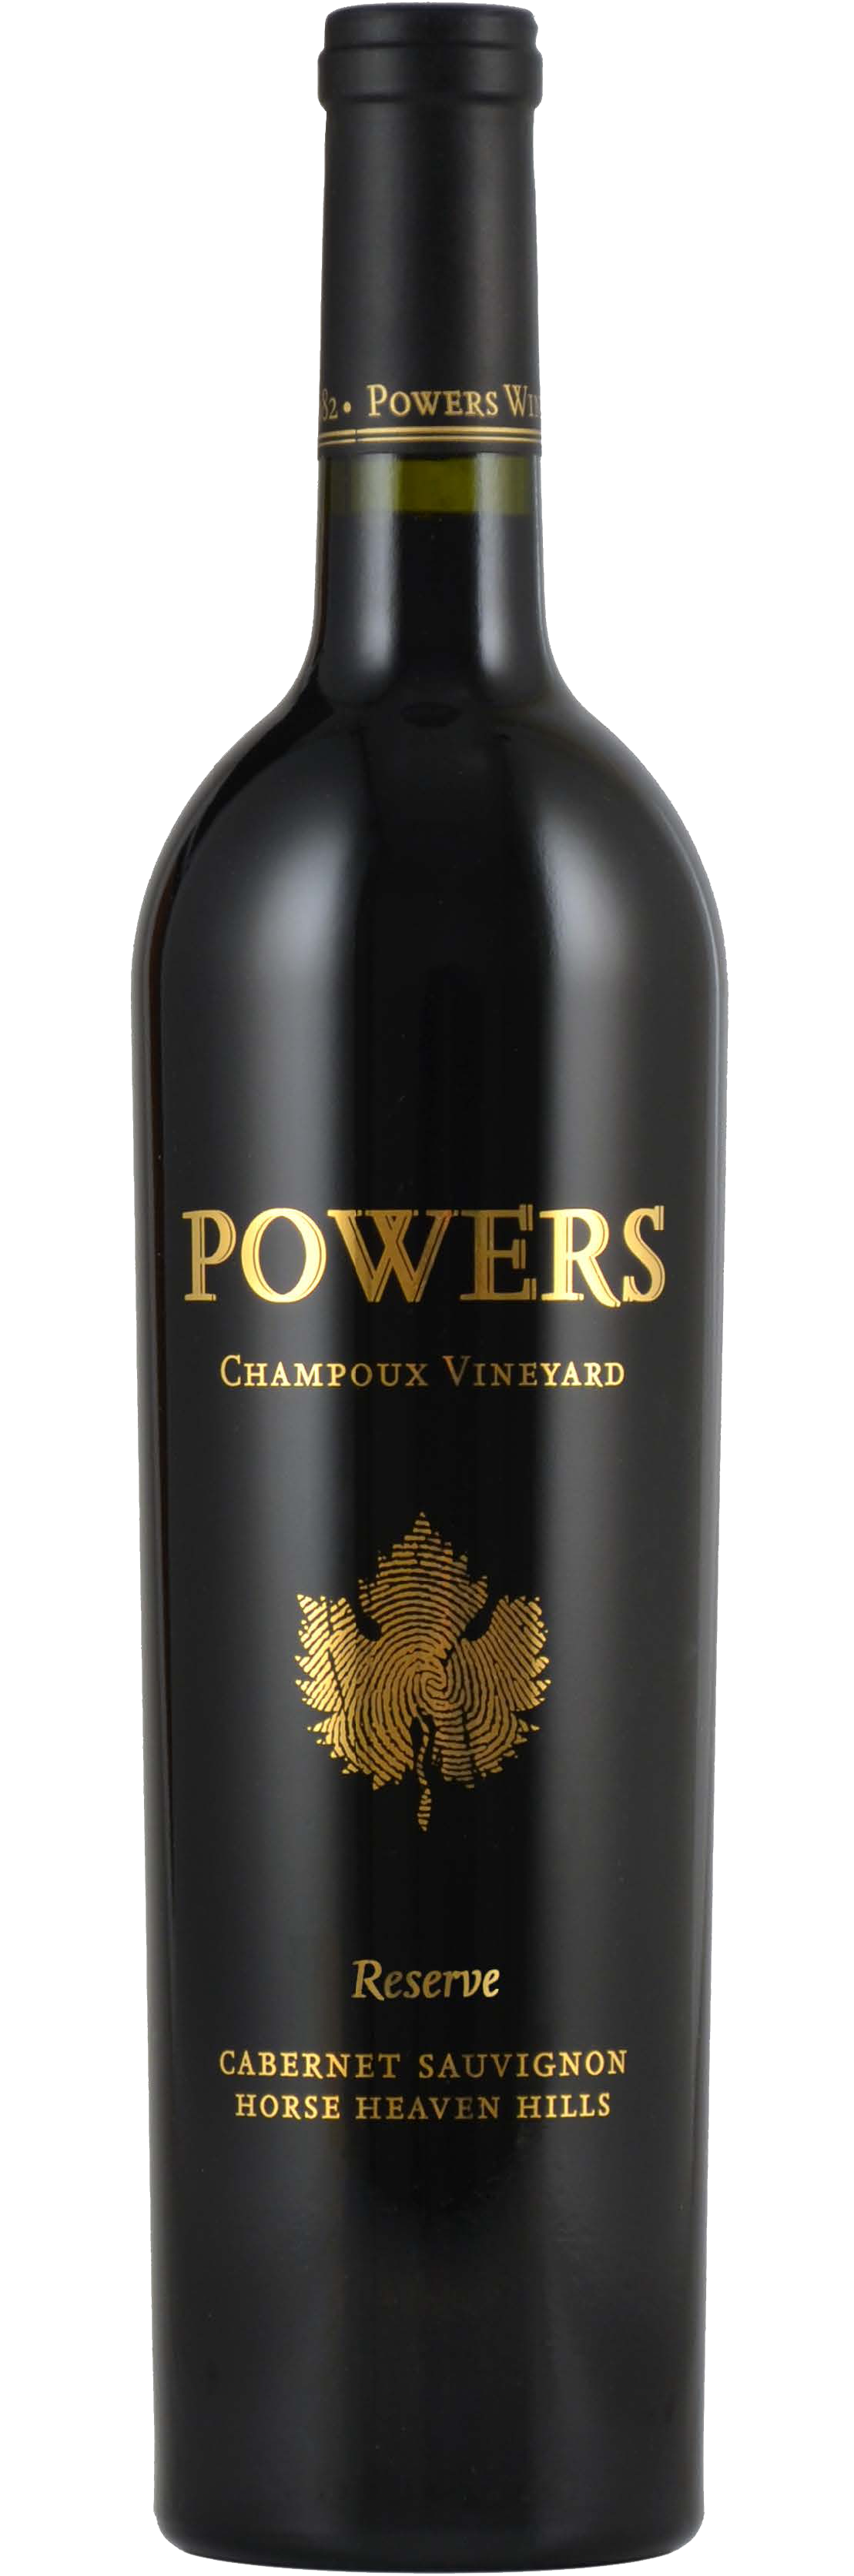 Bottle image of Powers Champoux